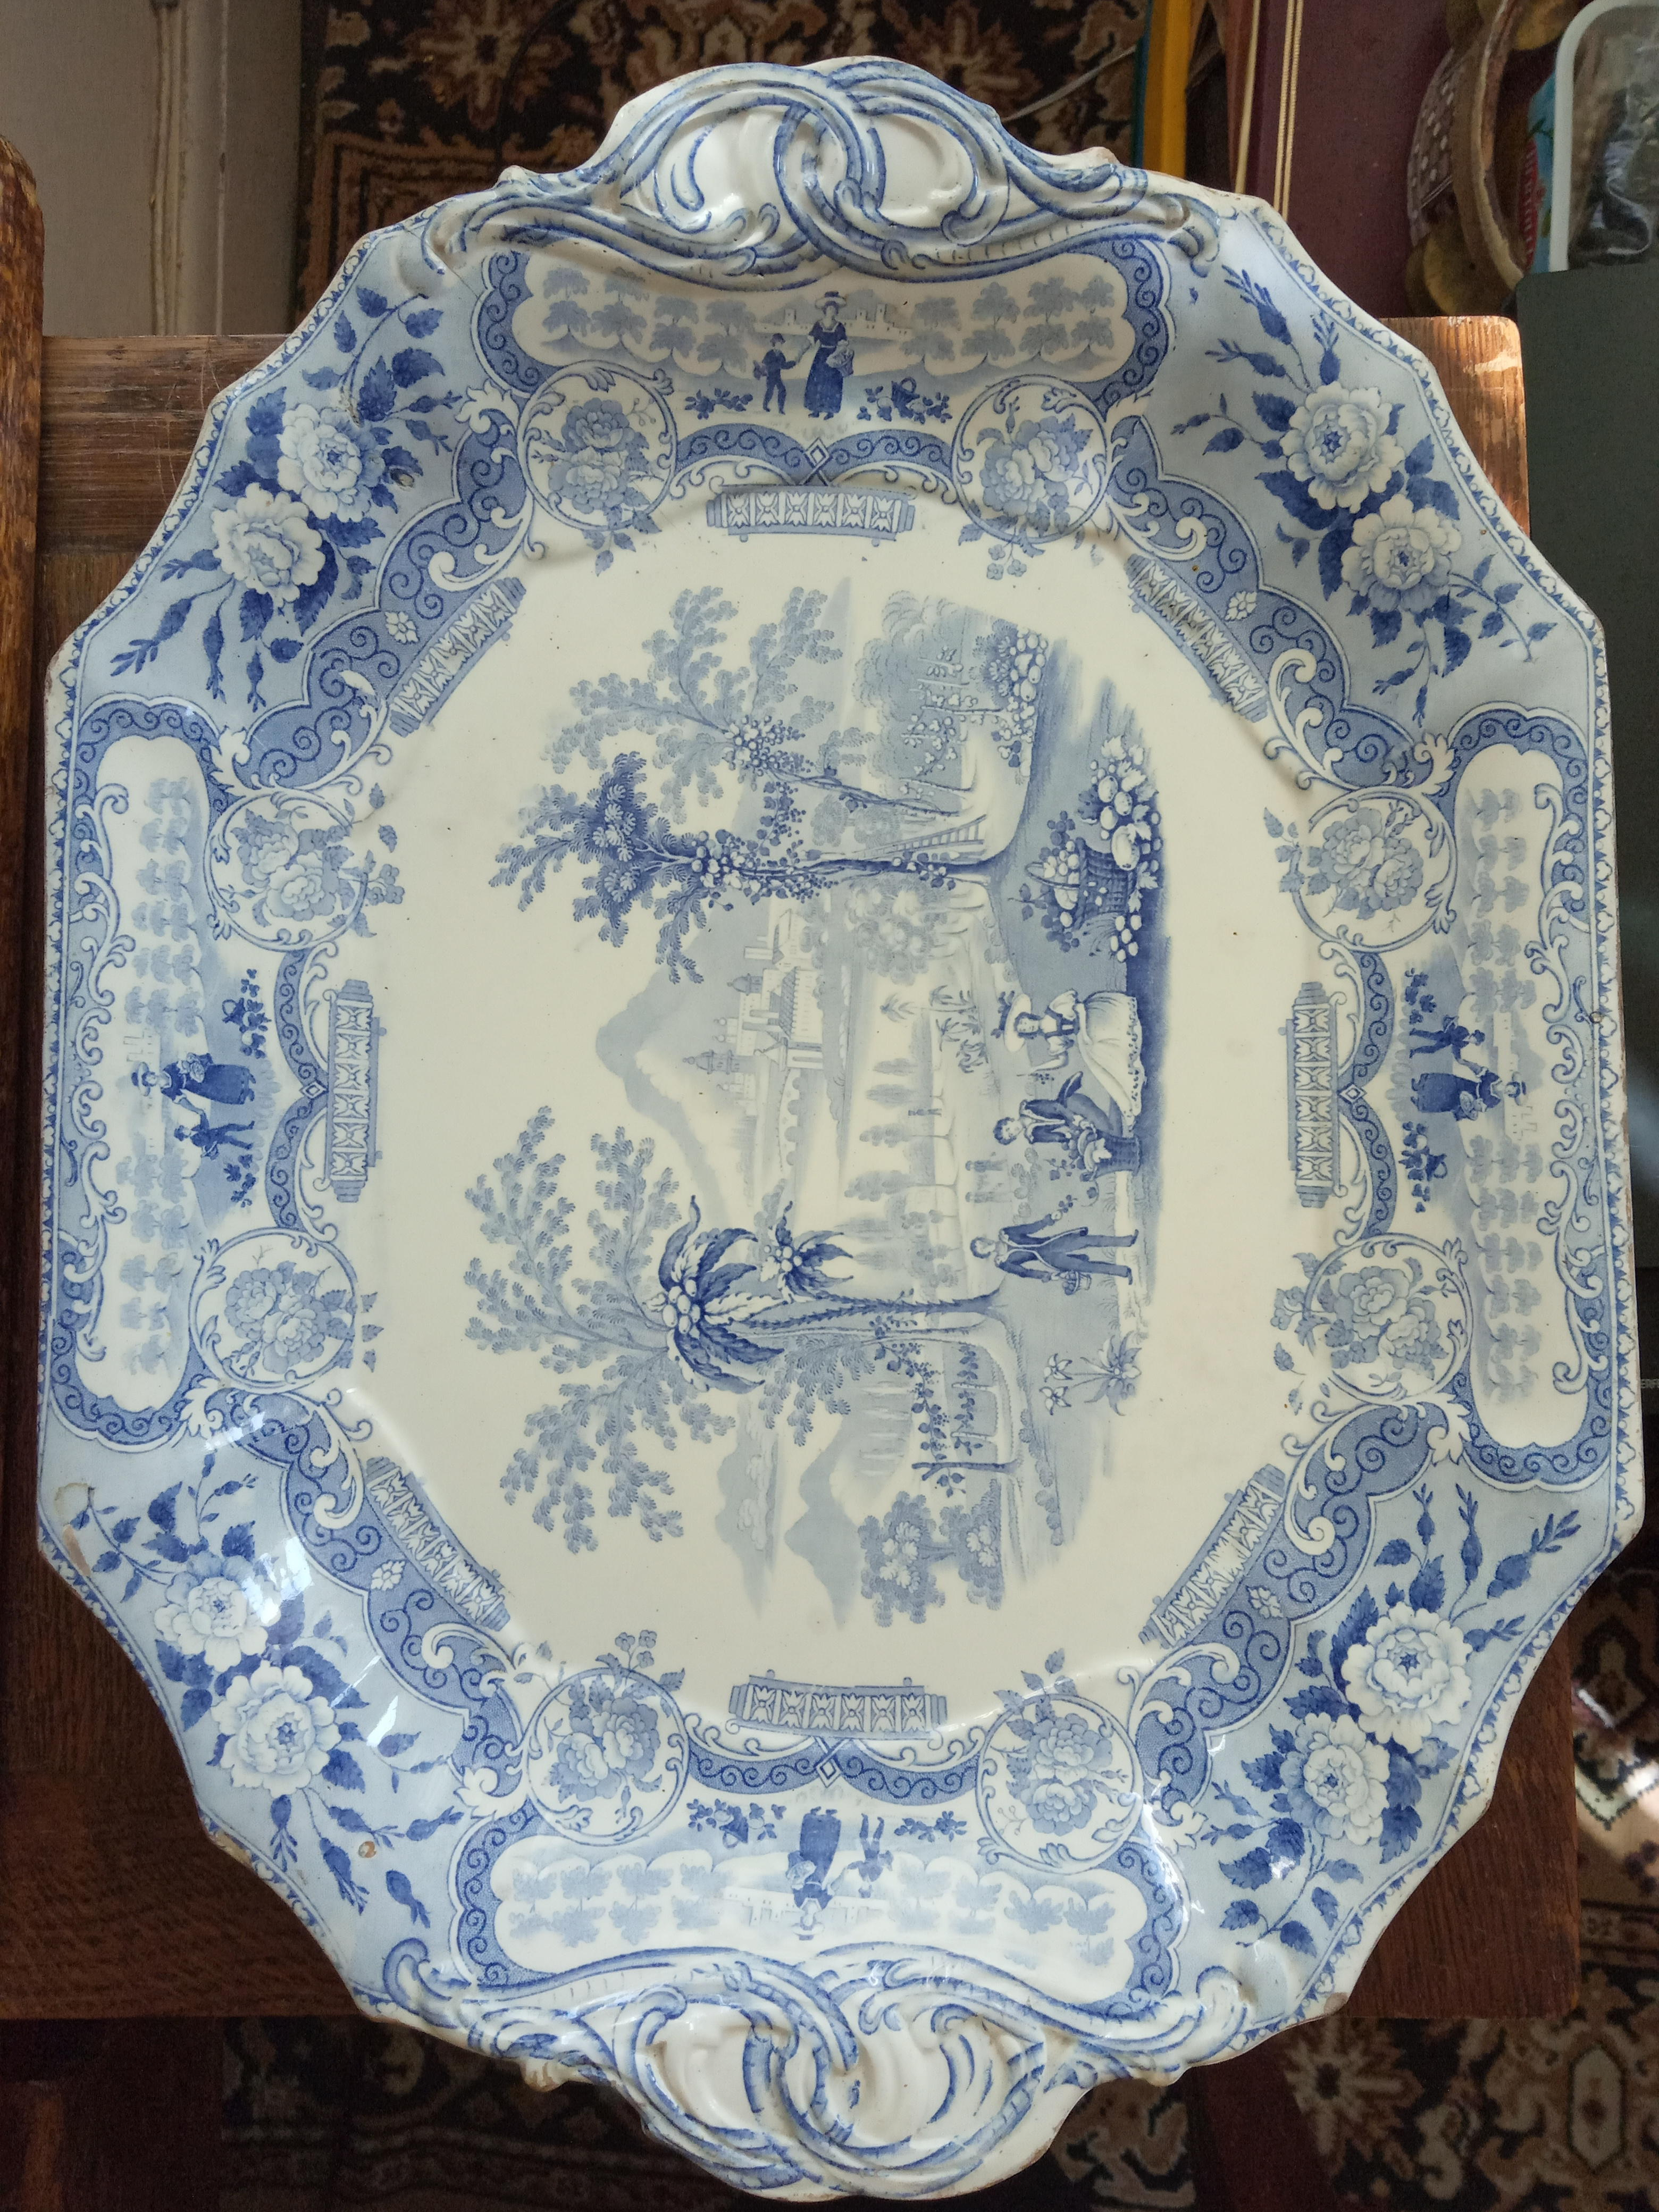 Delightful, vintage, blue and white transfer printed platter